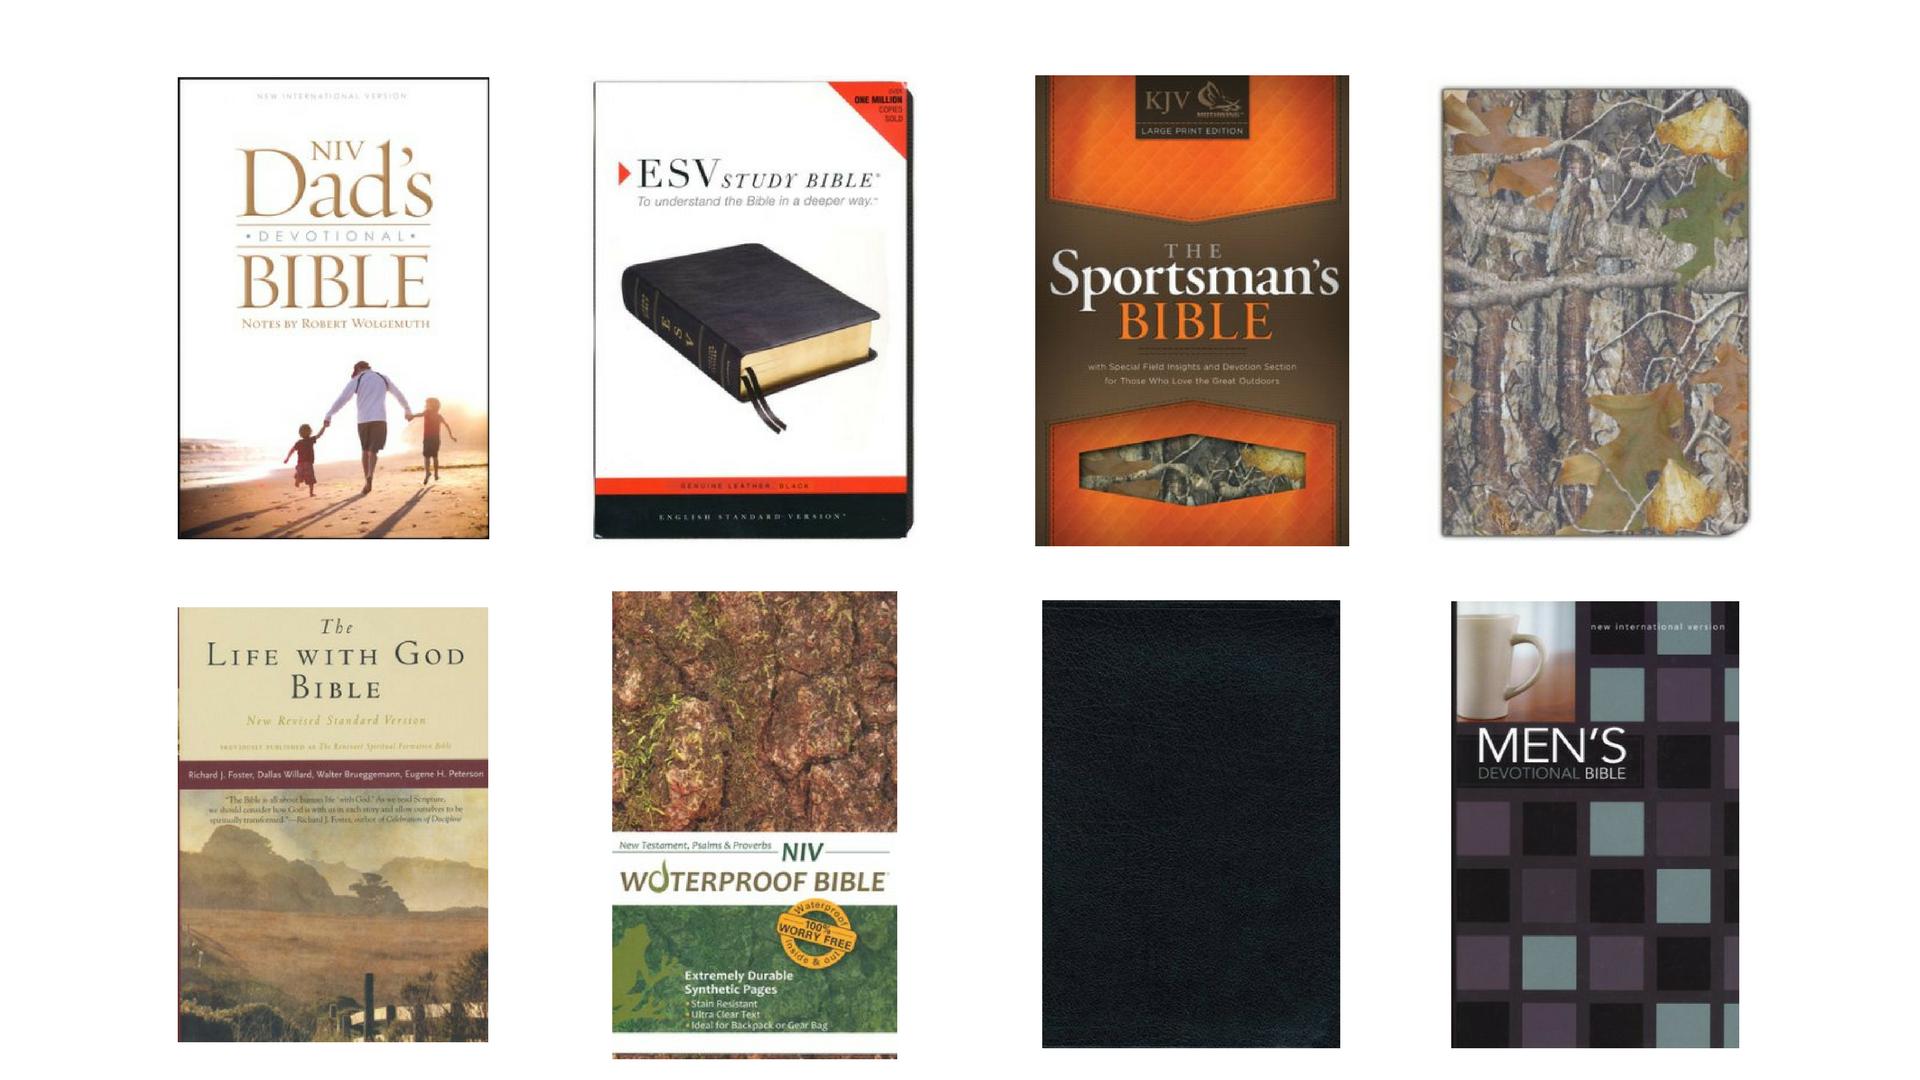 Mens bible gift guide Christmas holiday